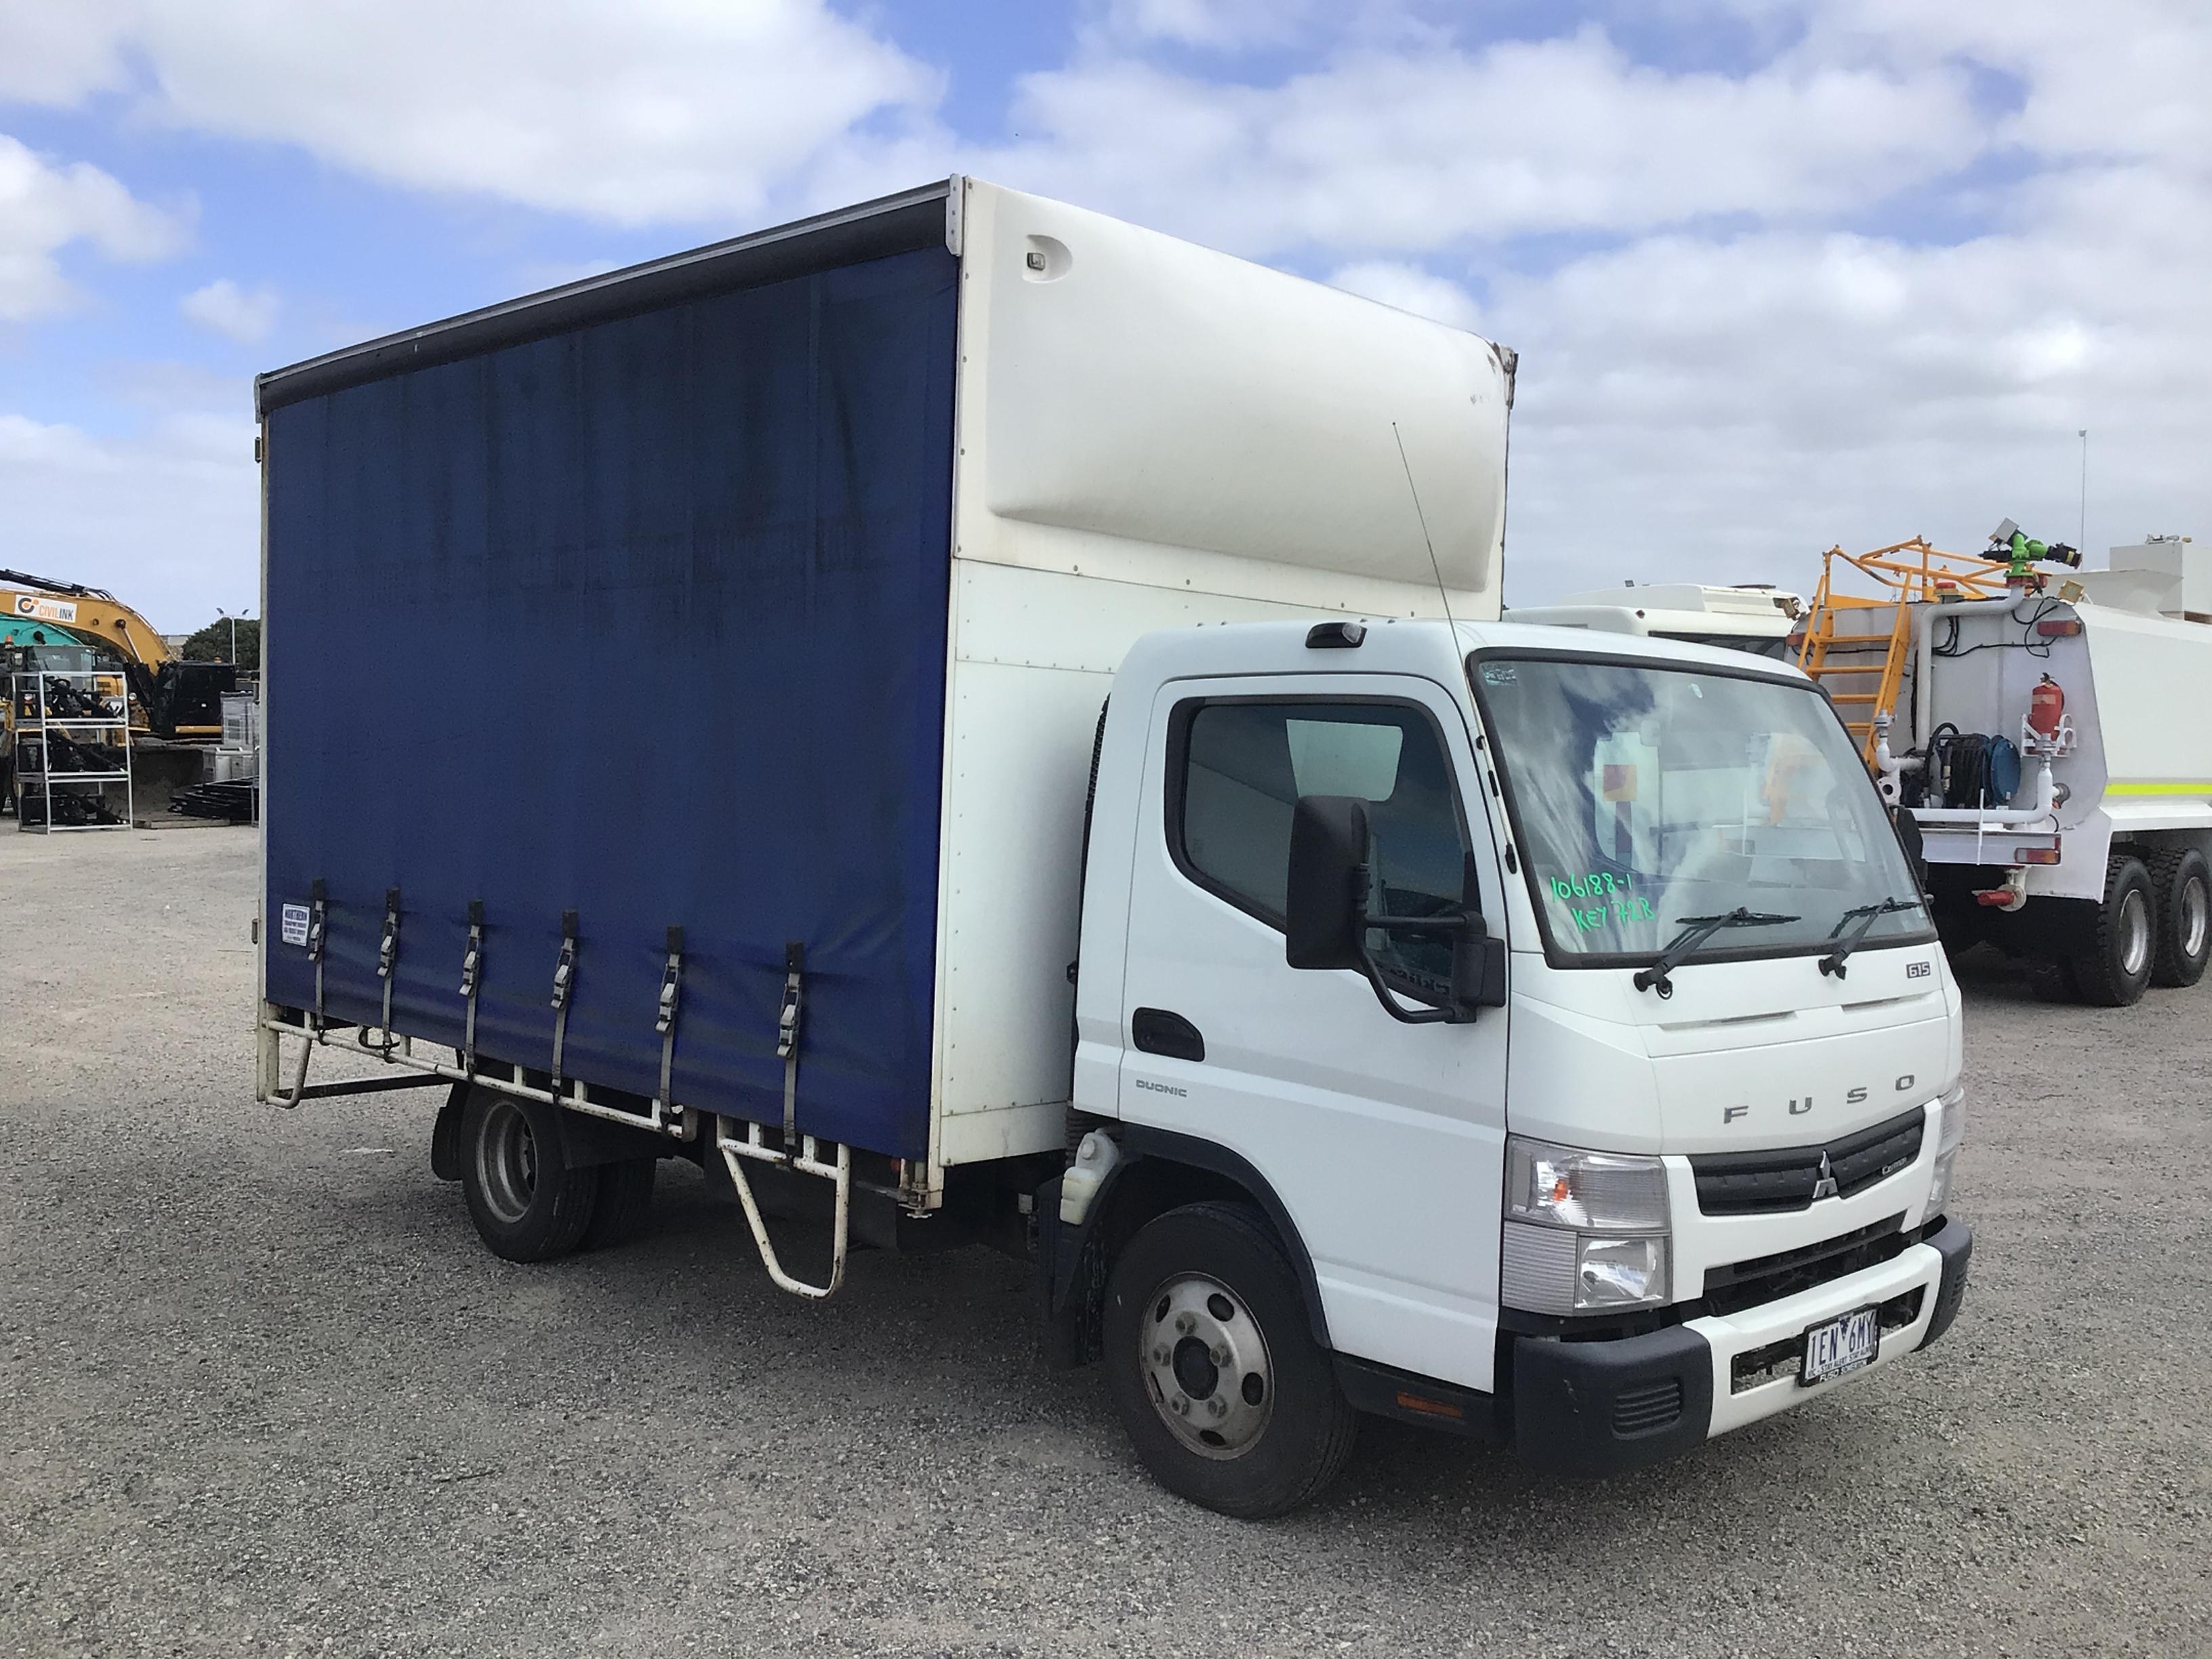 2015 Mitsubishi Canter 4 x 2 Curtainsider Rigid Truck